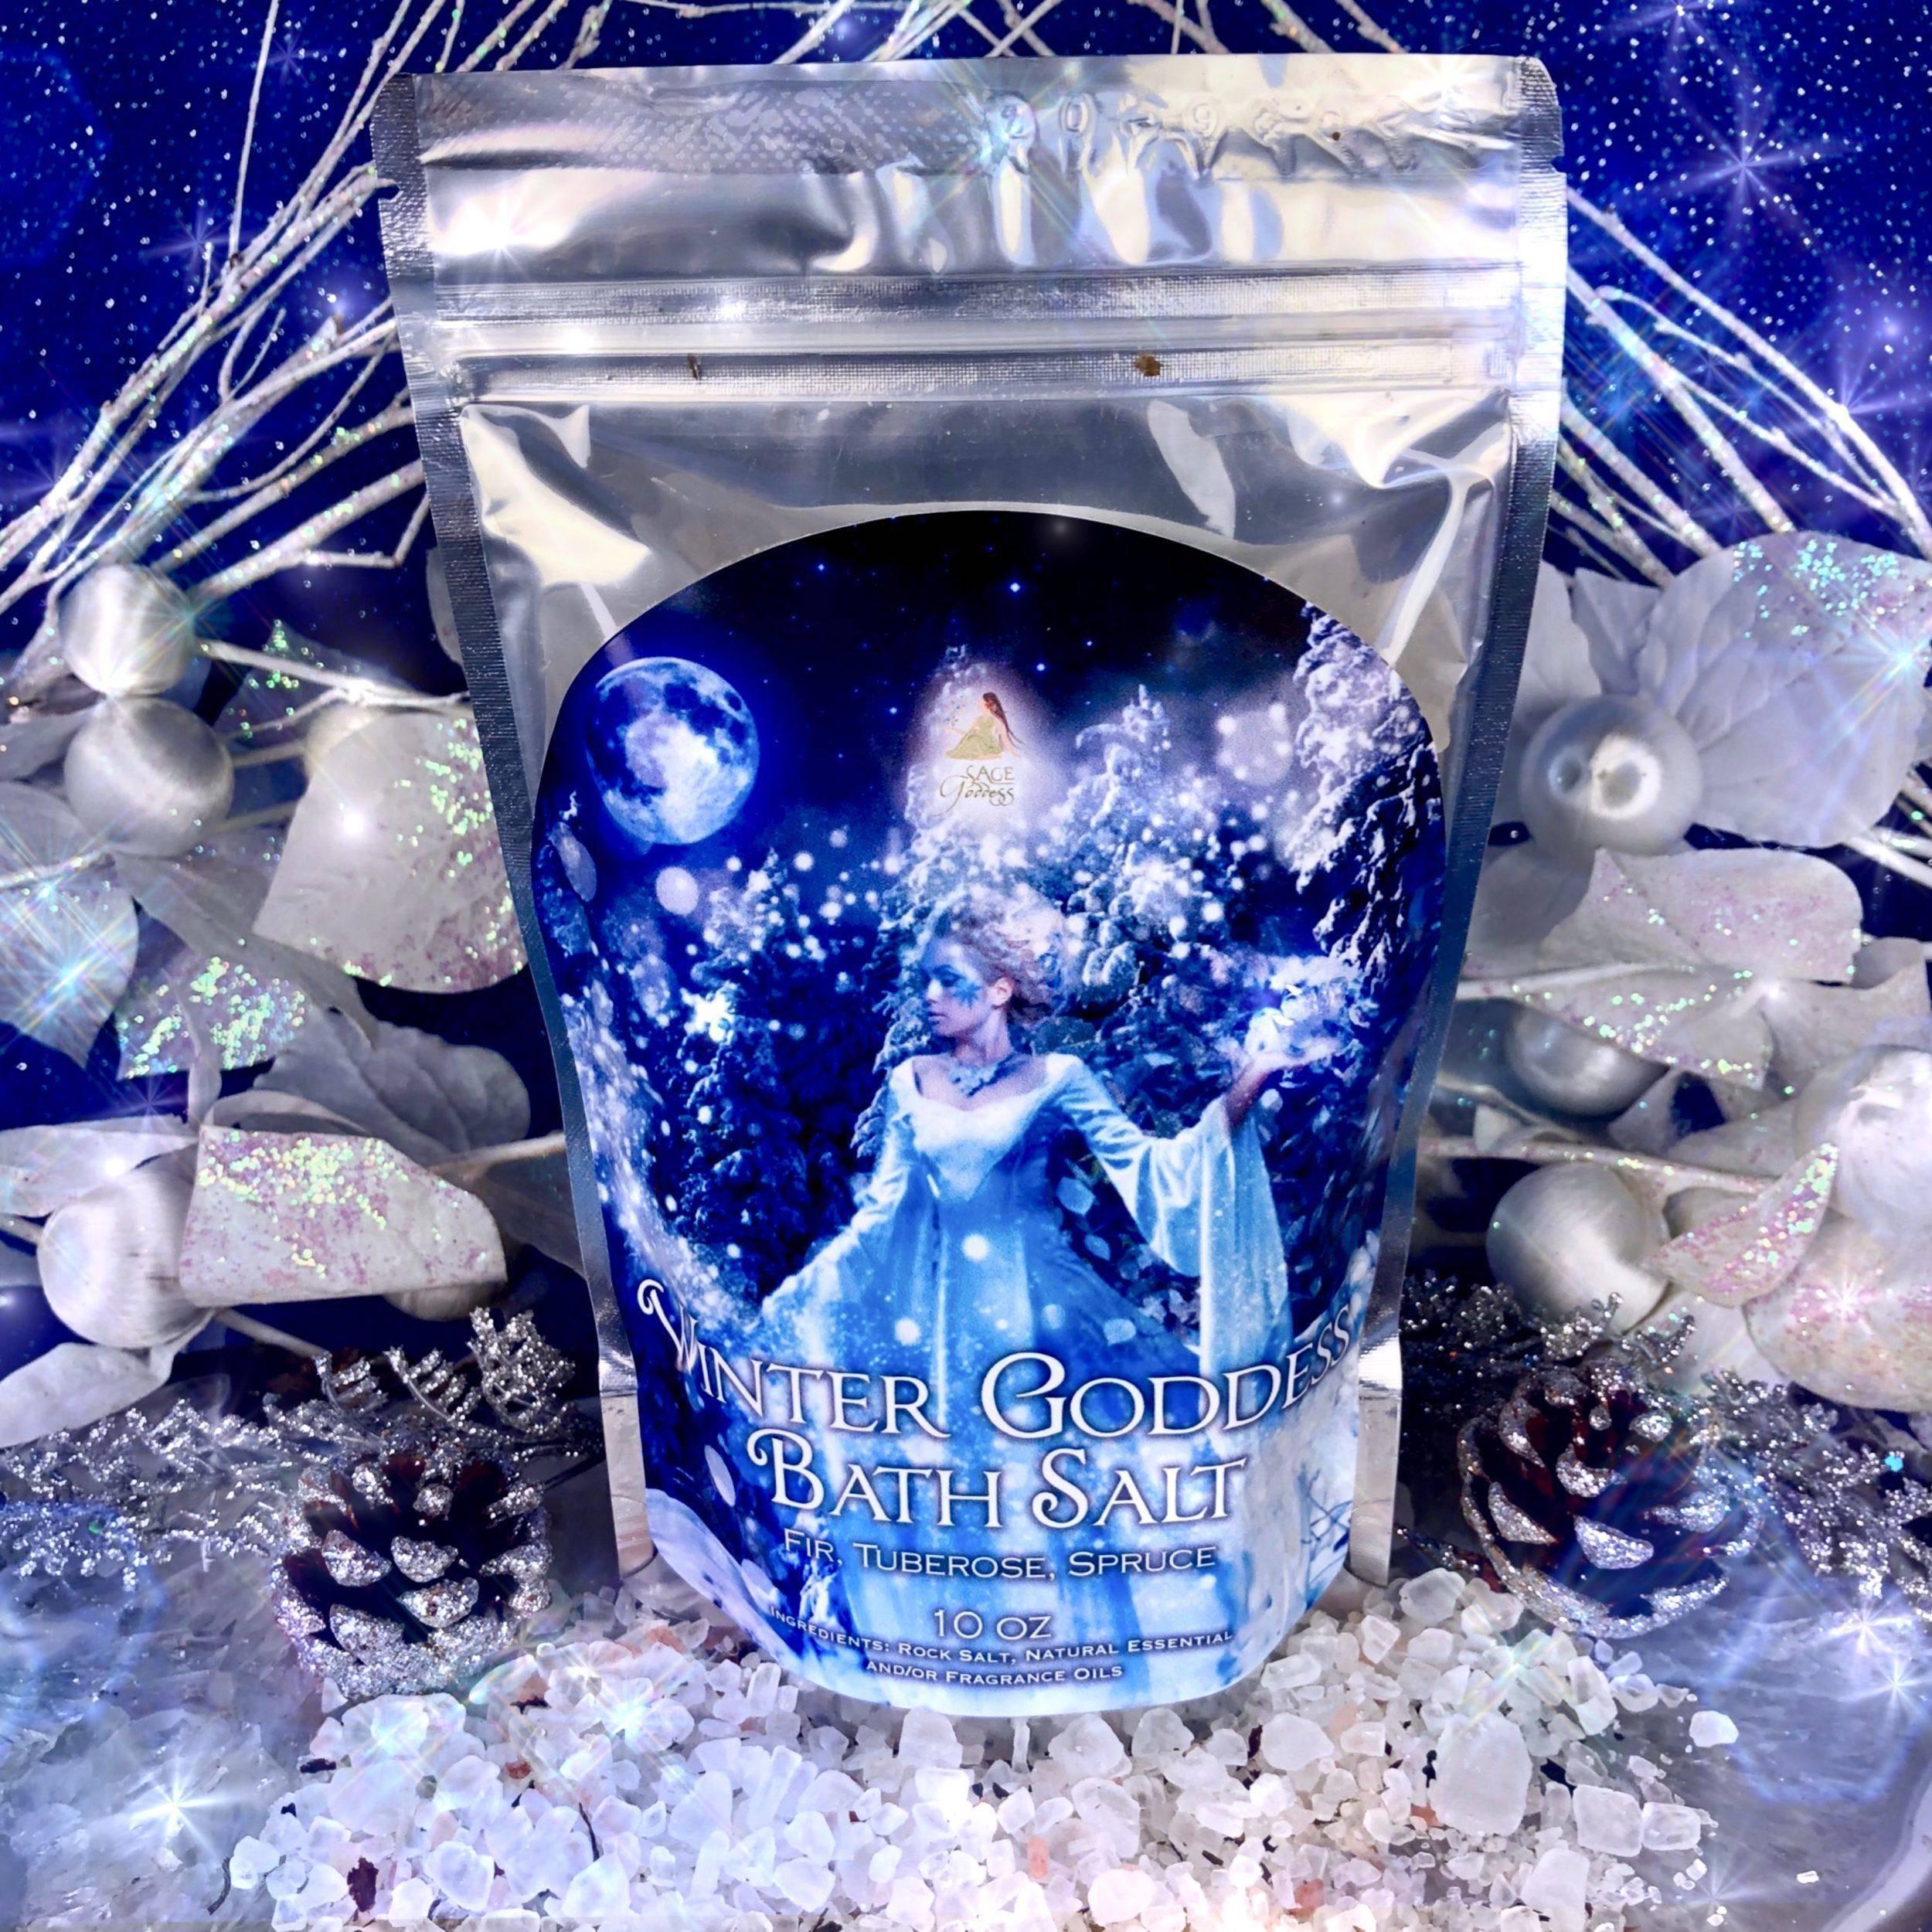 Winter_Goddess_Bath_Salts_1of1_11_3